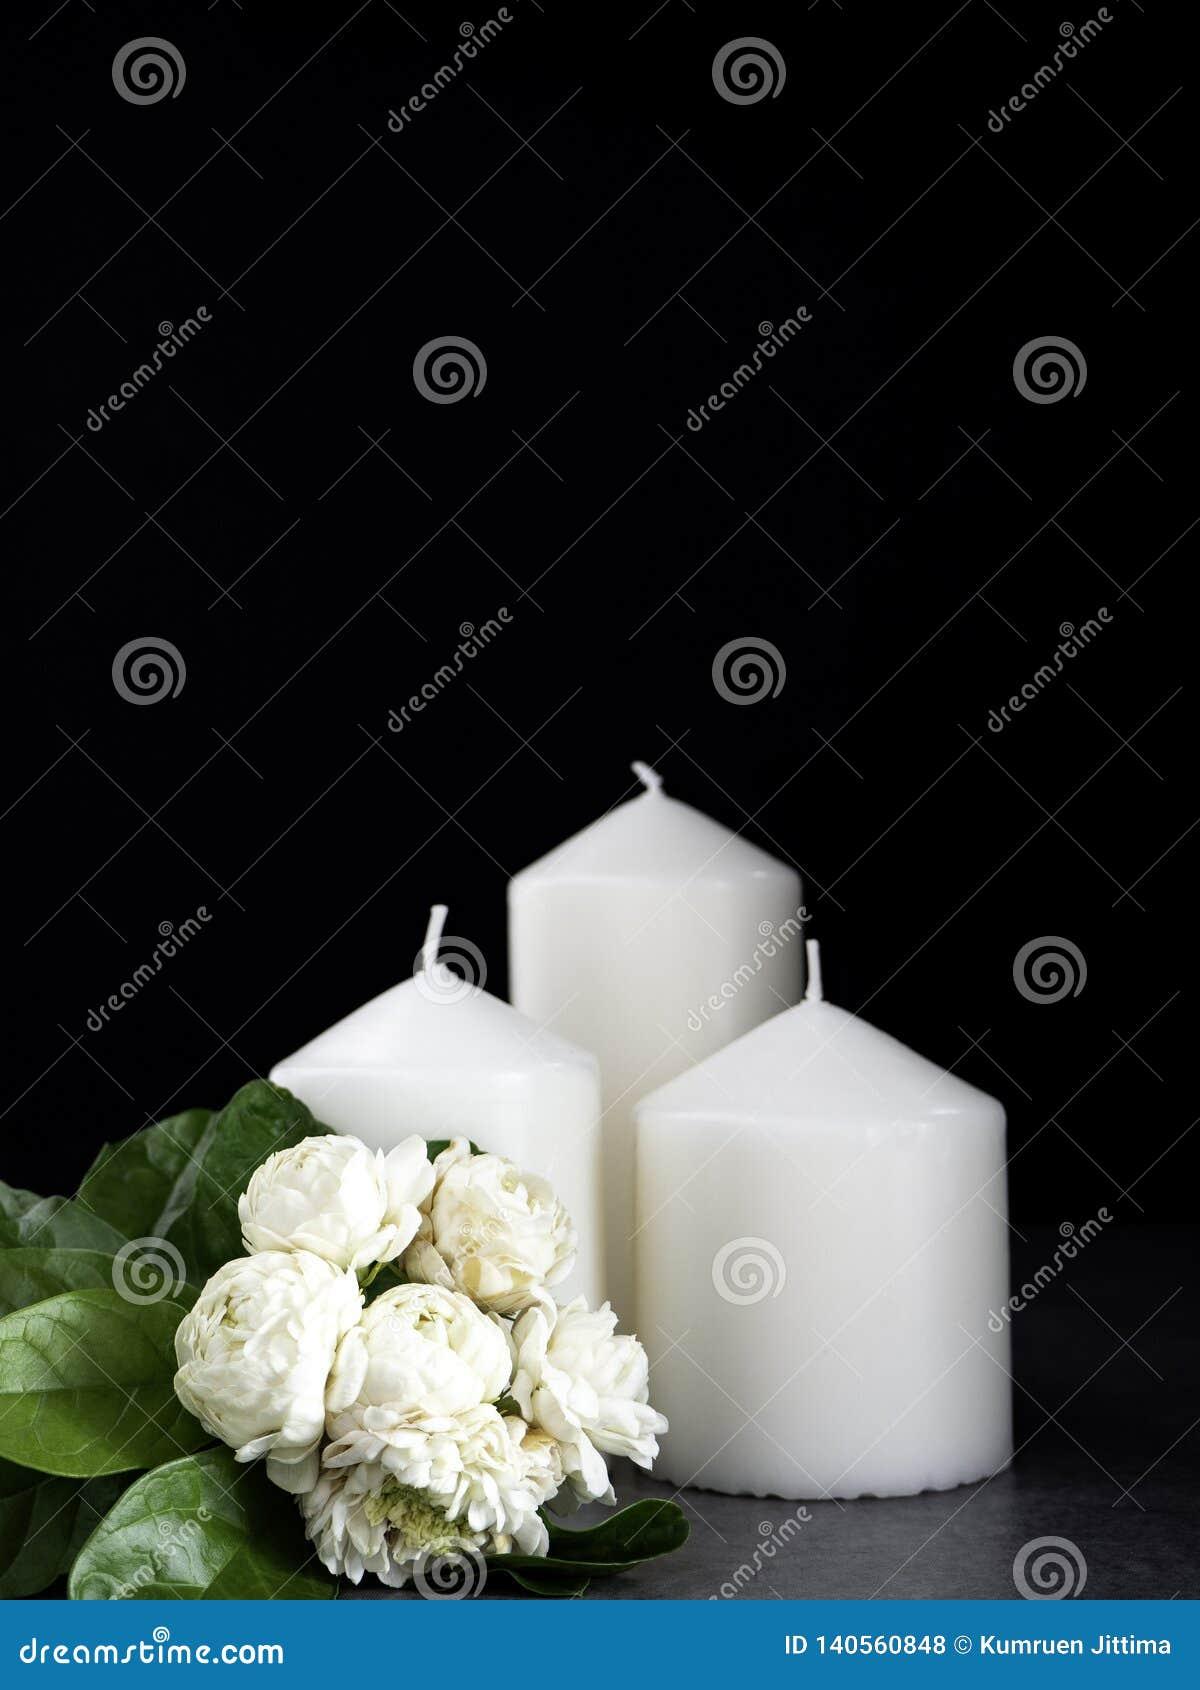 Jasmine and candles on dark background